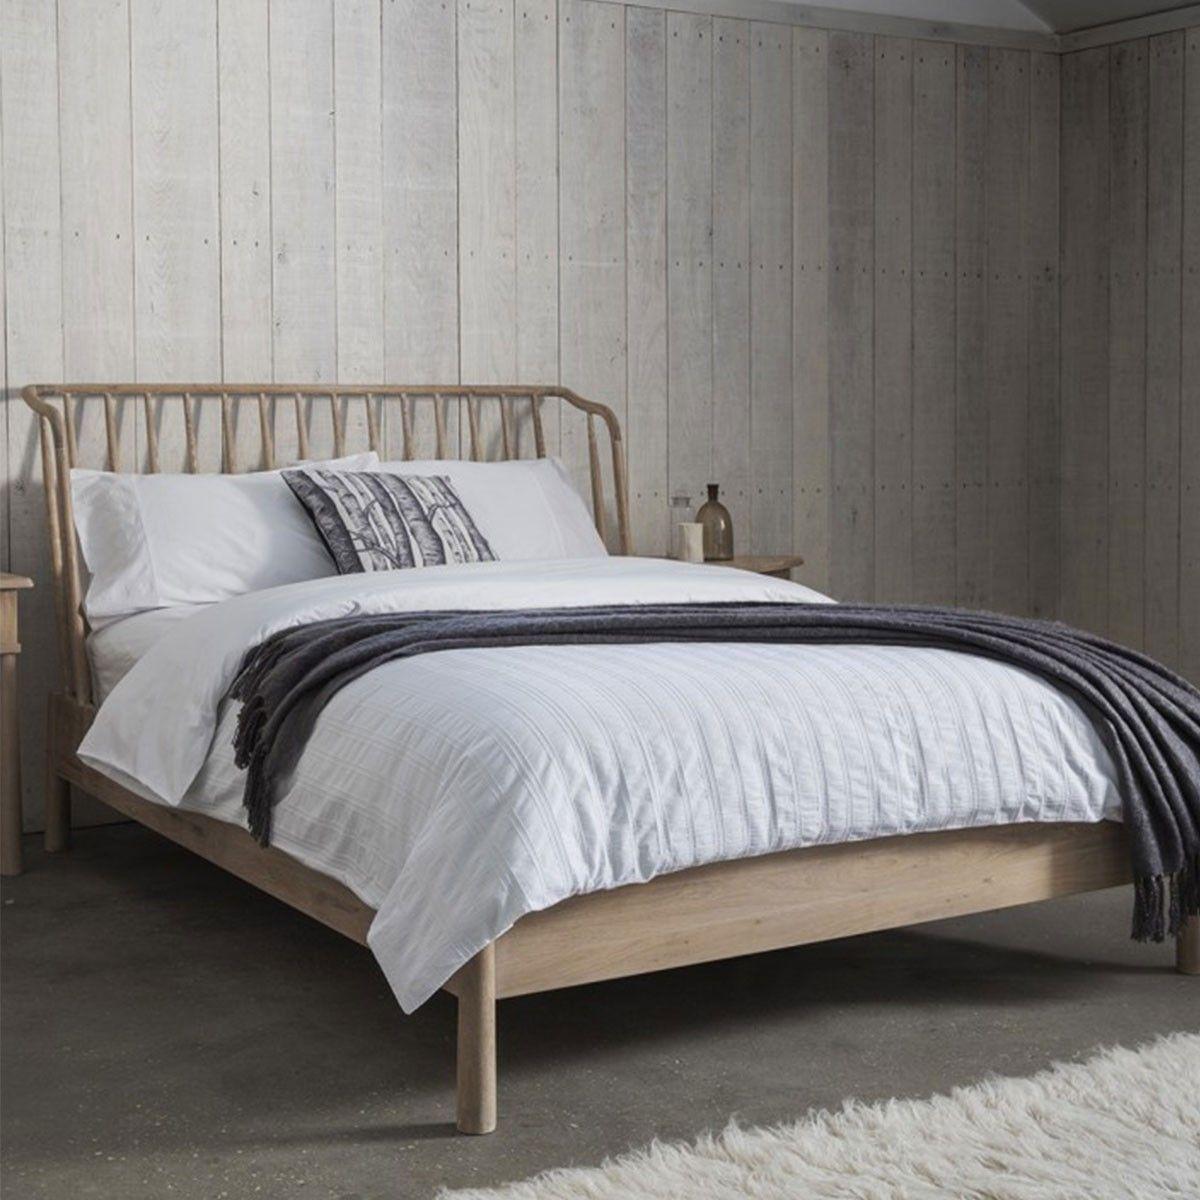 HUTCH® - Wycombe Nordic Oak 5ft Bed Frame By Frank Hudson 1,049 UK ...